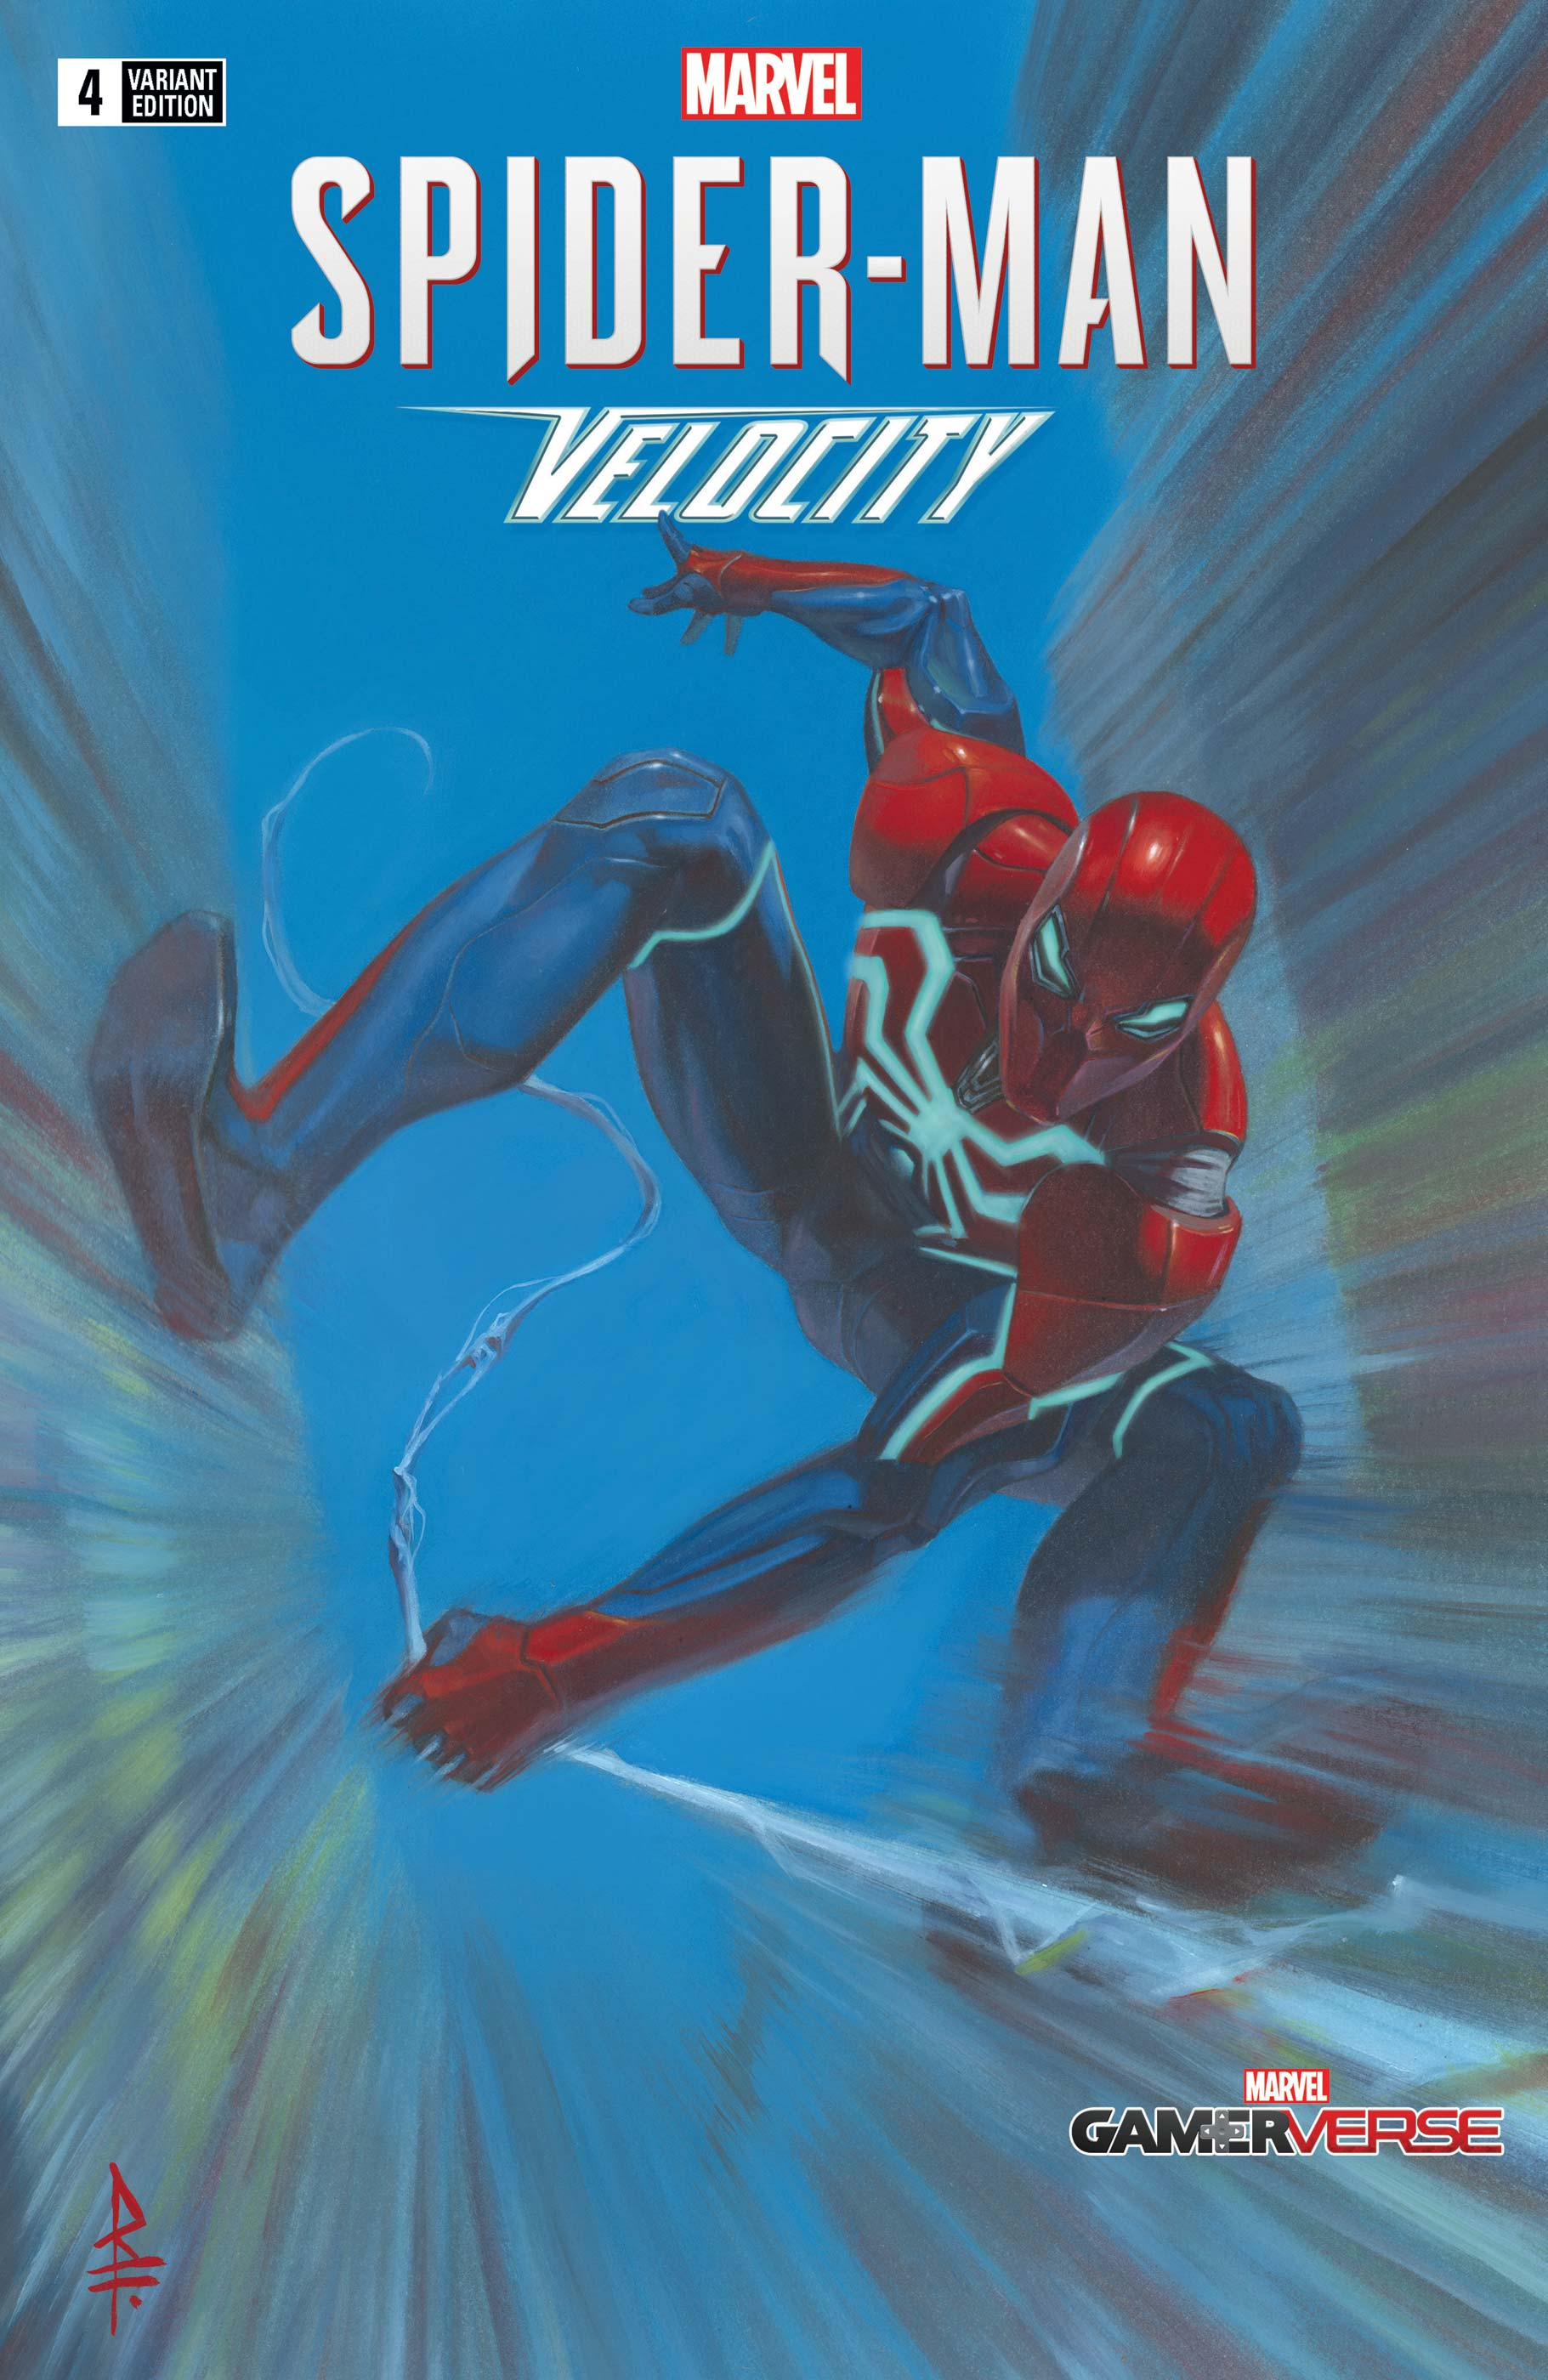 Marvel's Spider-Man Velocity Vol 1 4 Federici Variant.jpg